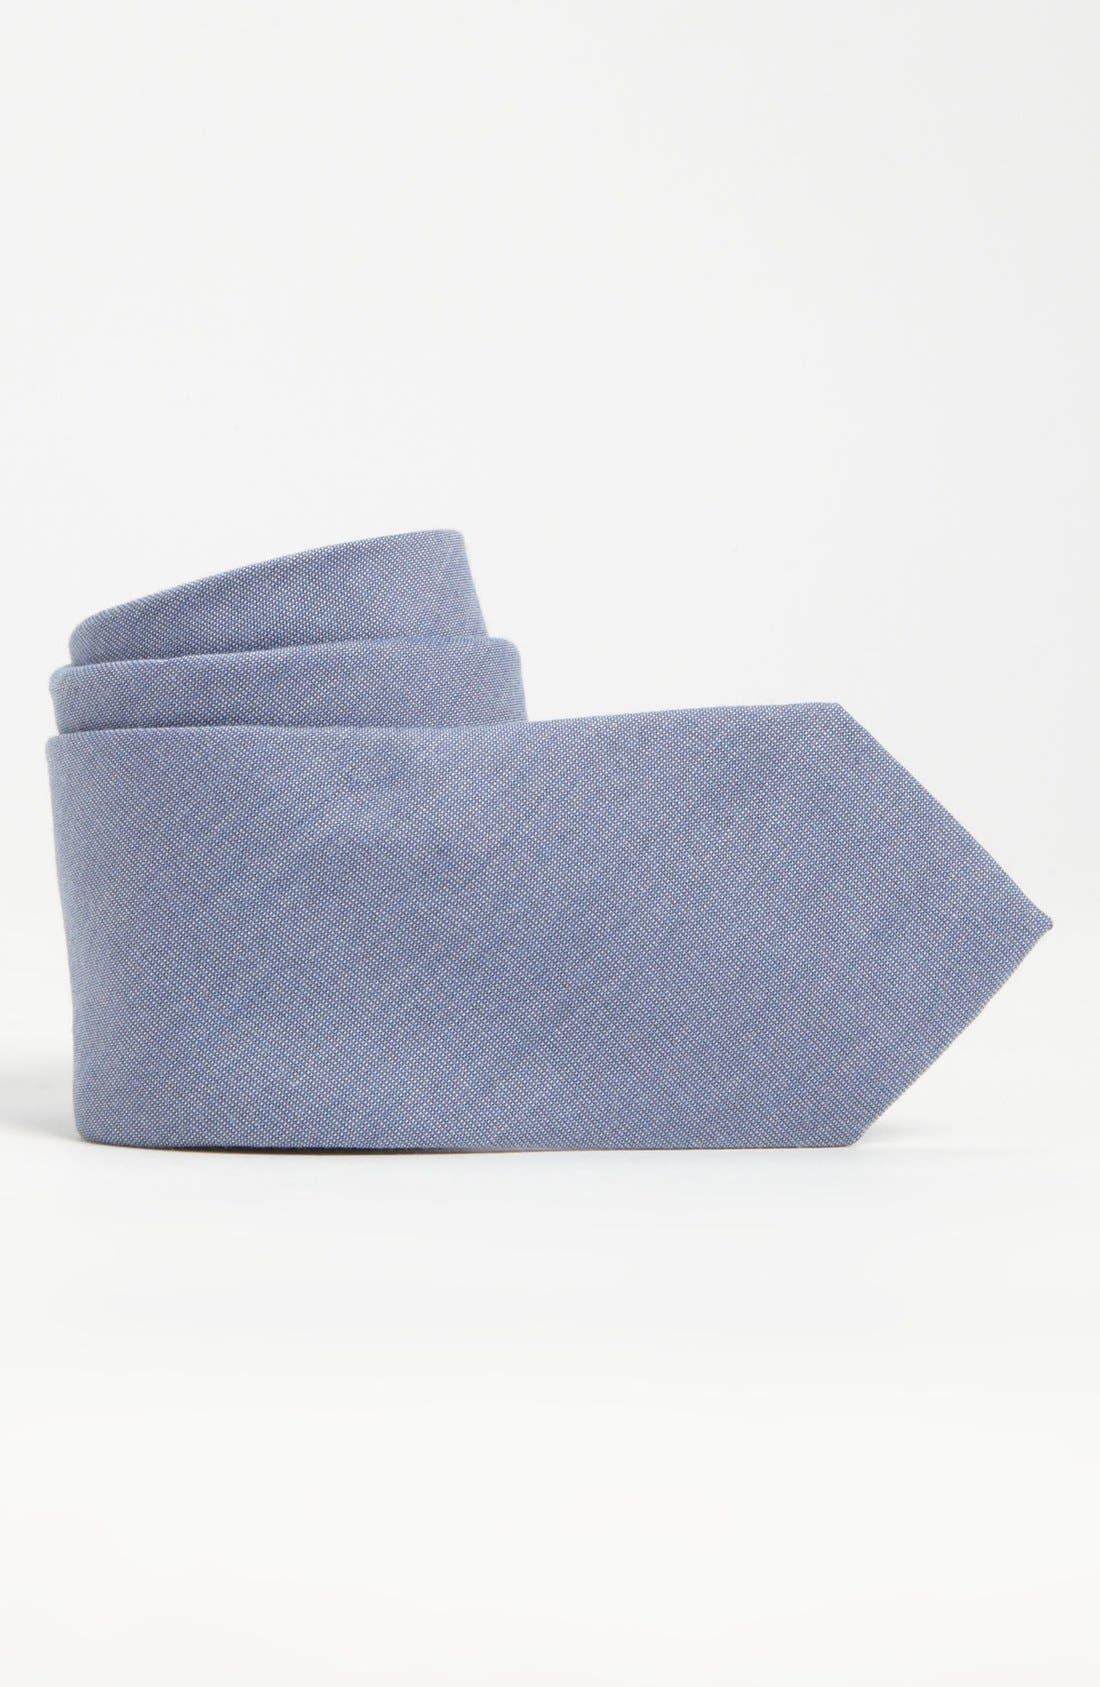 Alternate Image 1 Selected - Nordstrom Woven Tie (Big Boys)